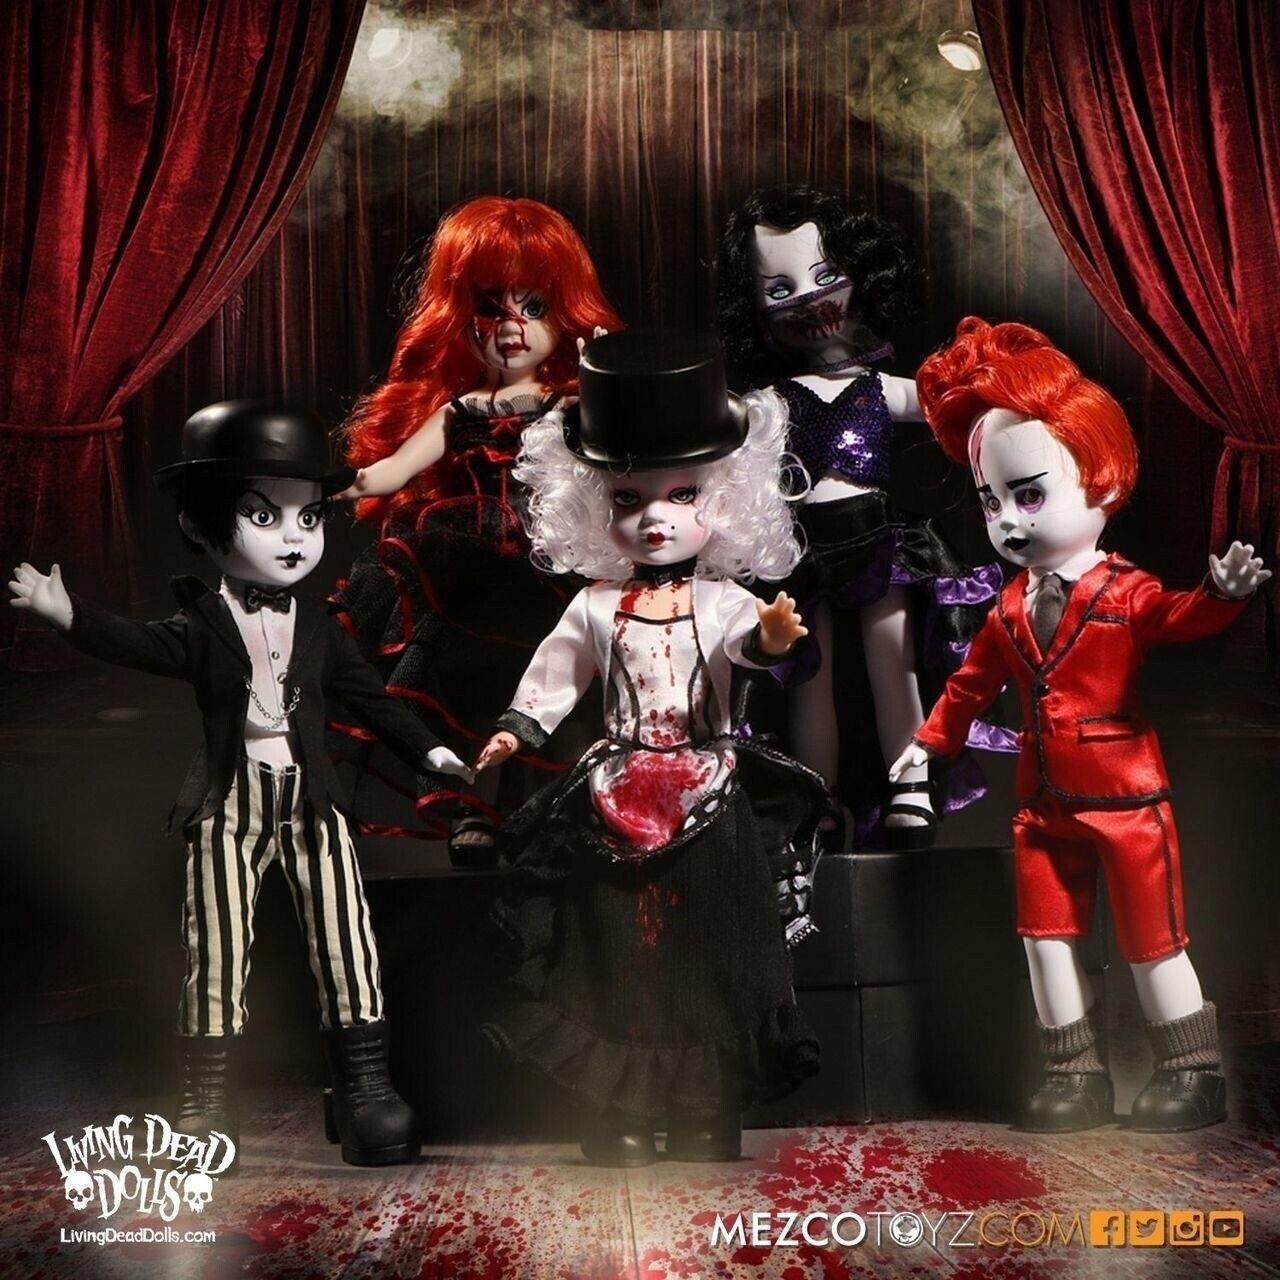 Mezco Toyz Living Dead Dolls Series 33-Juego de 5